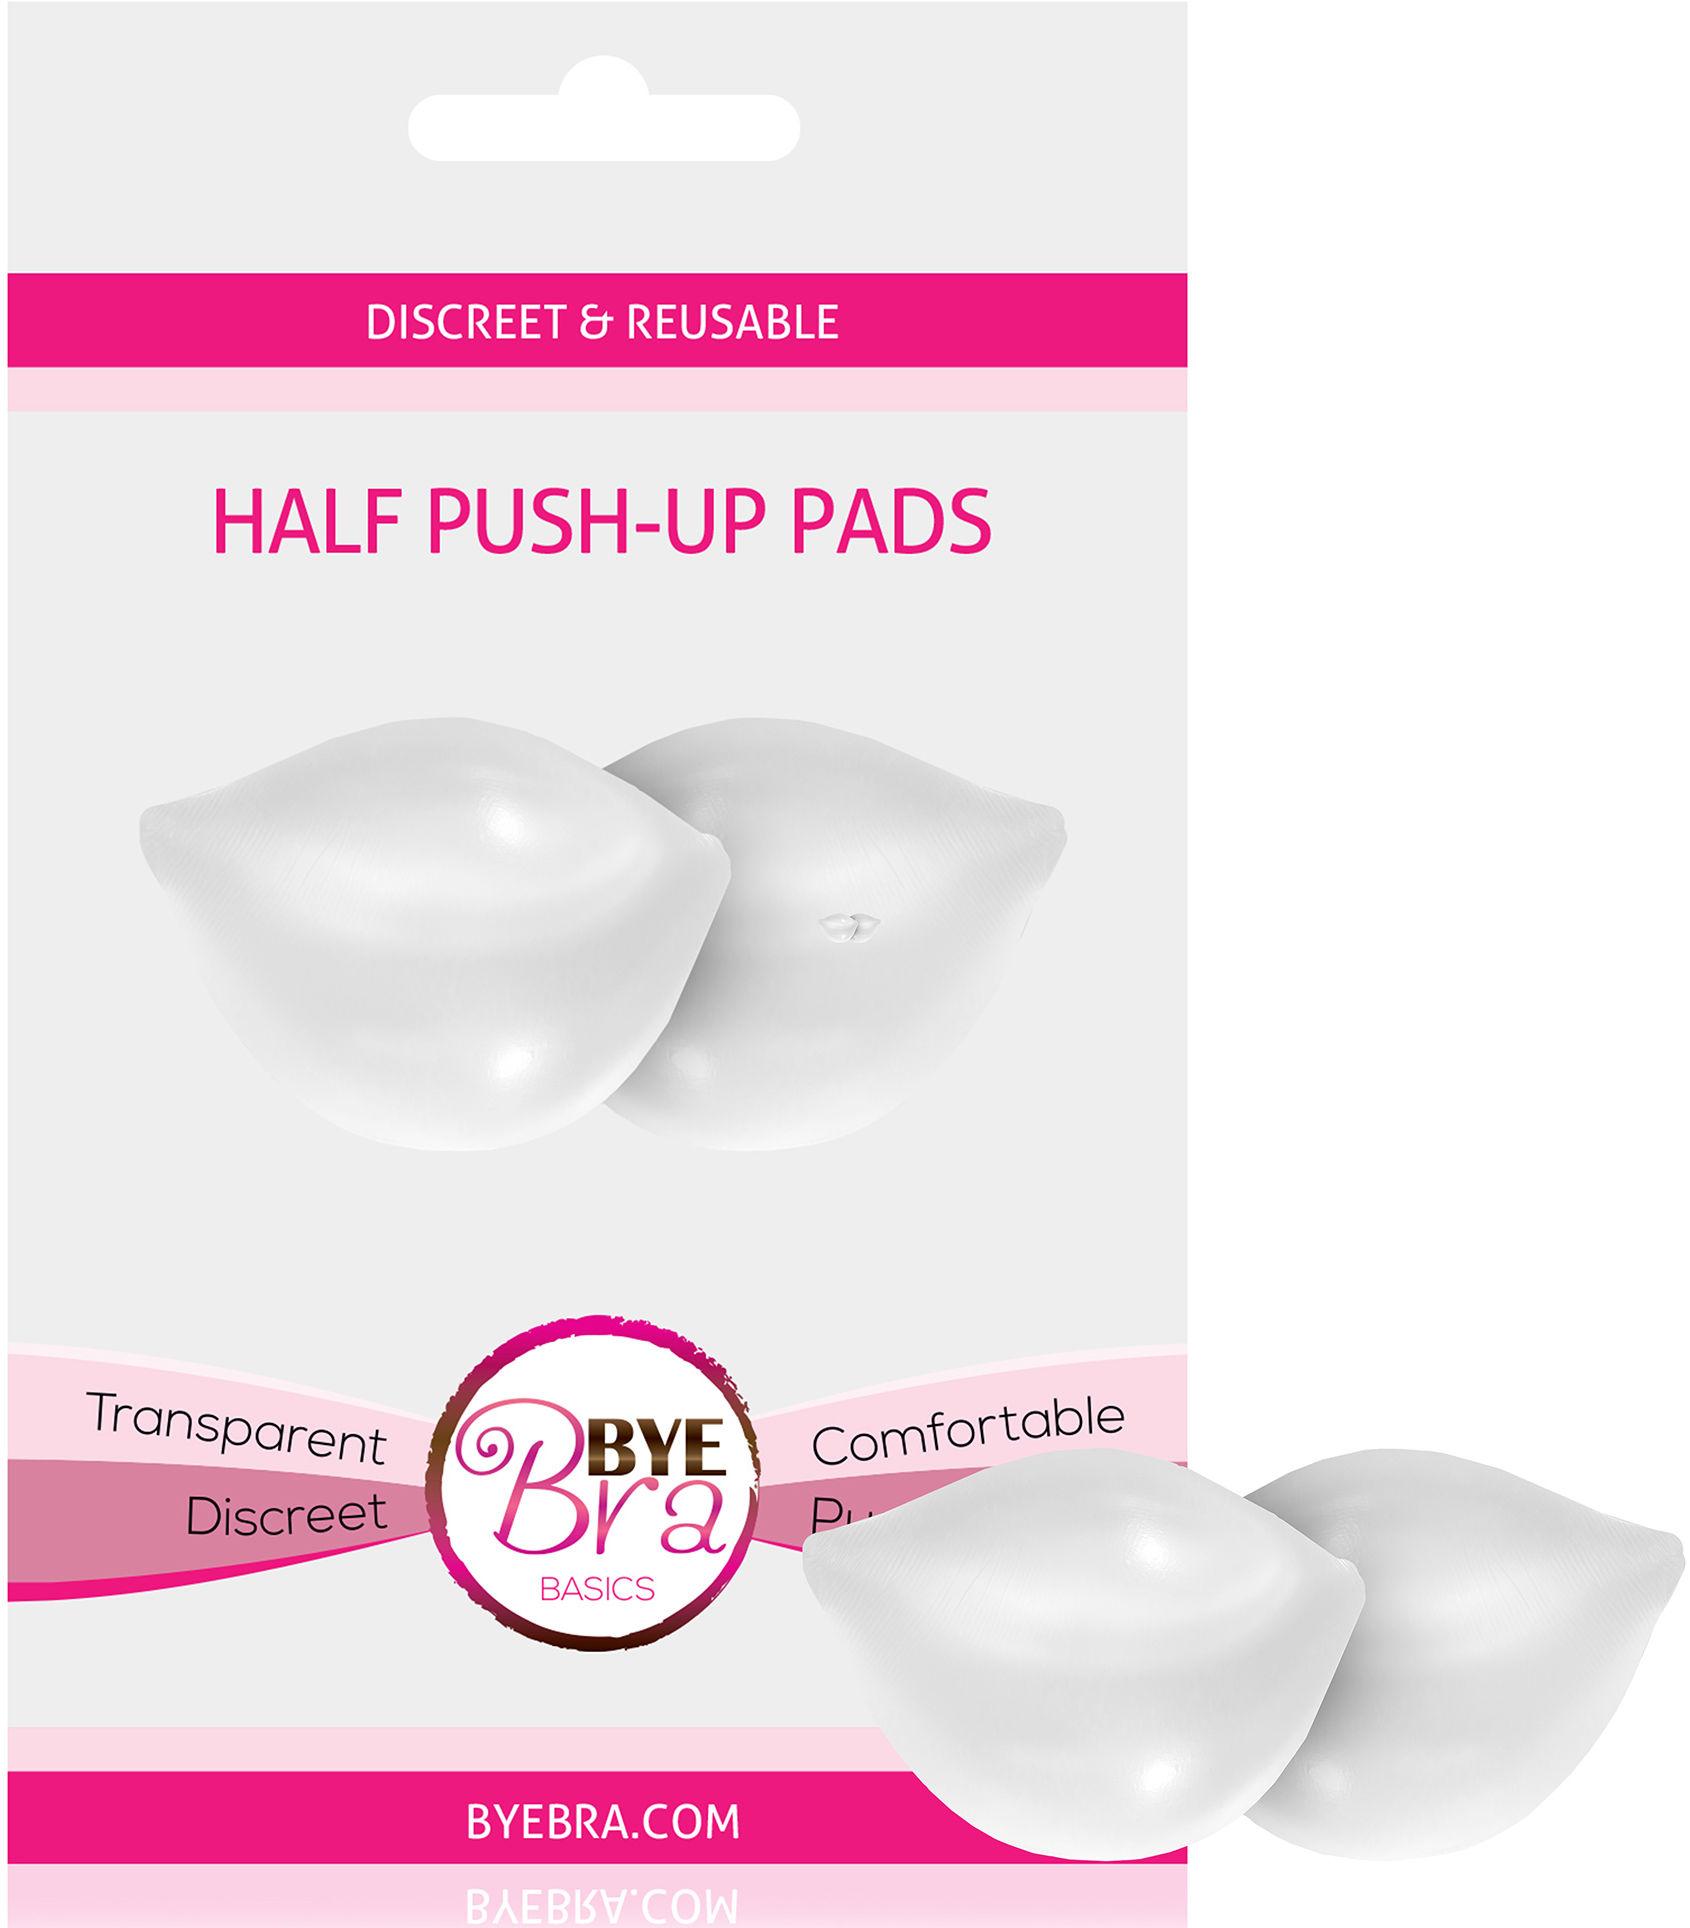 Bye Bra Half Push-Up Pads Clear